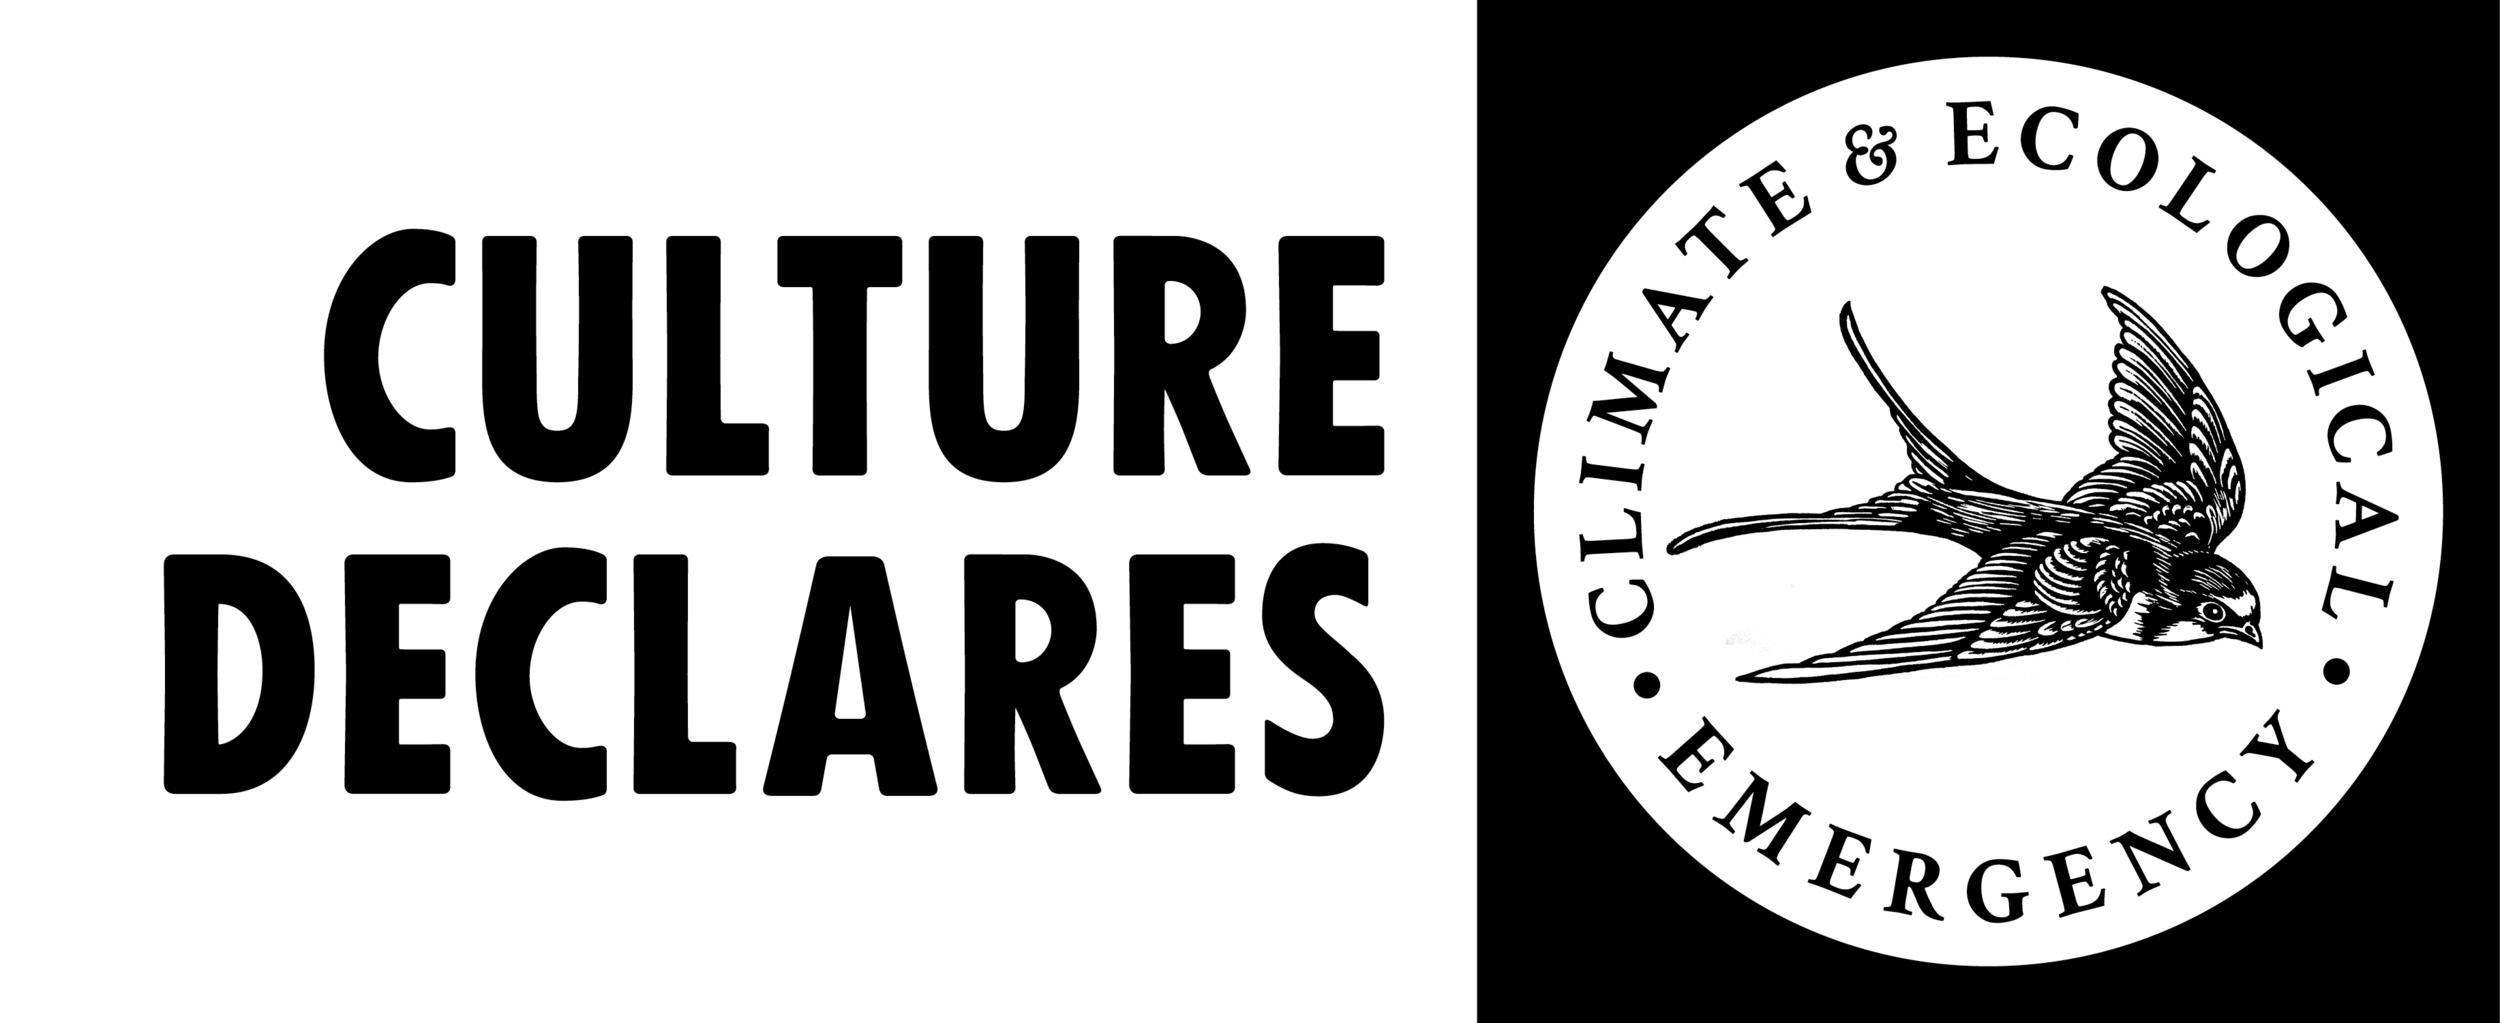 CultureDeclaresKite-HORIZ-BW-LRG.png